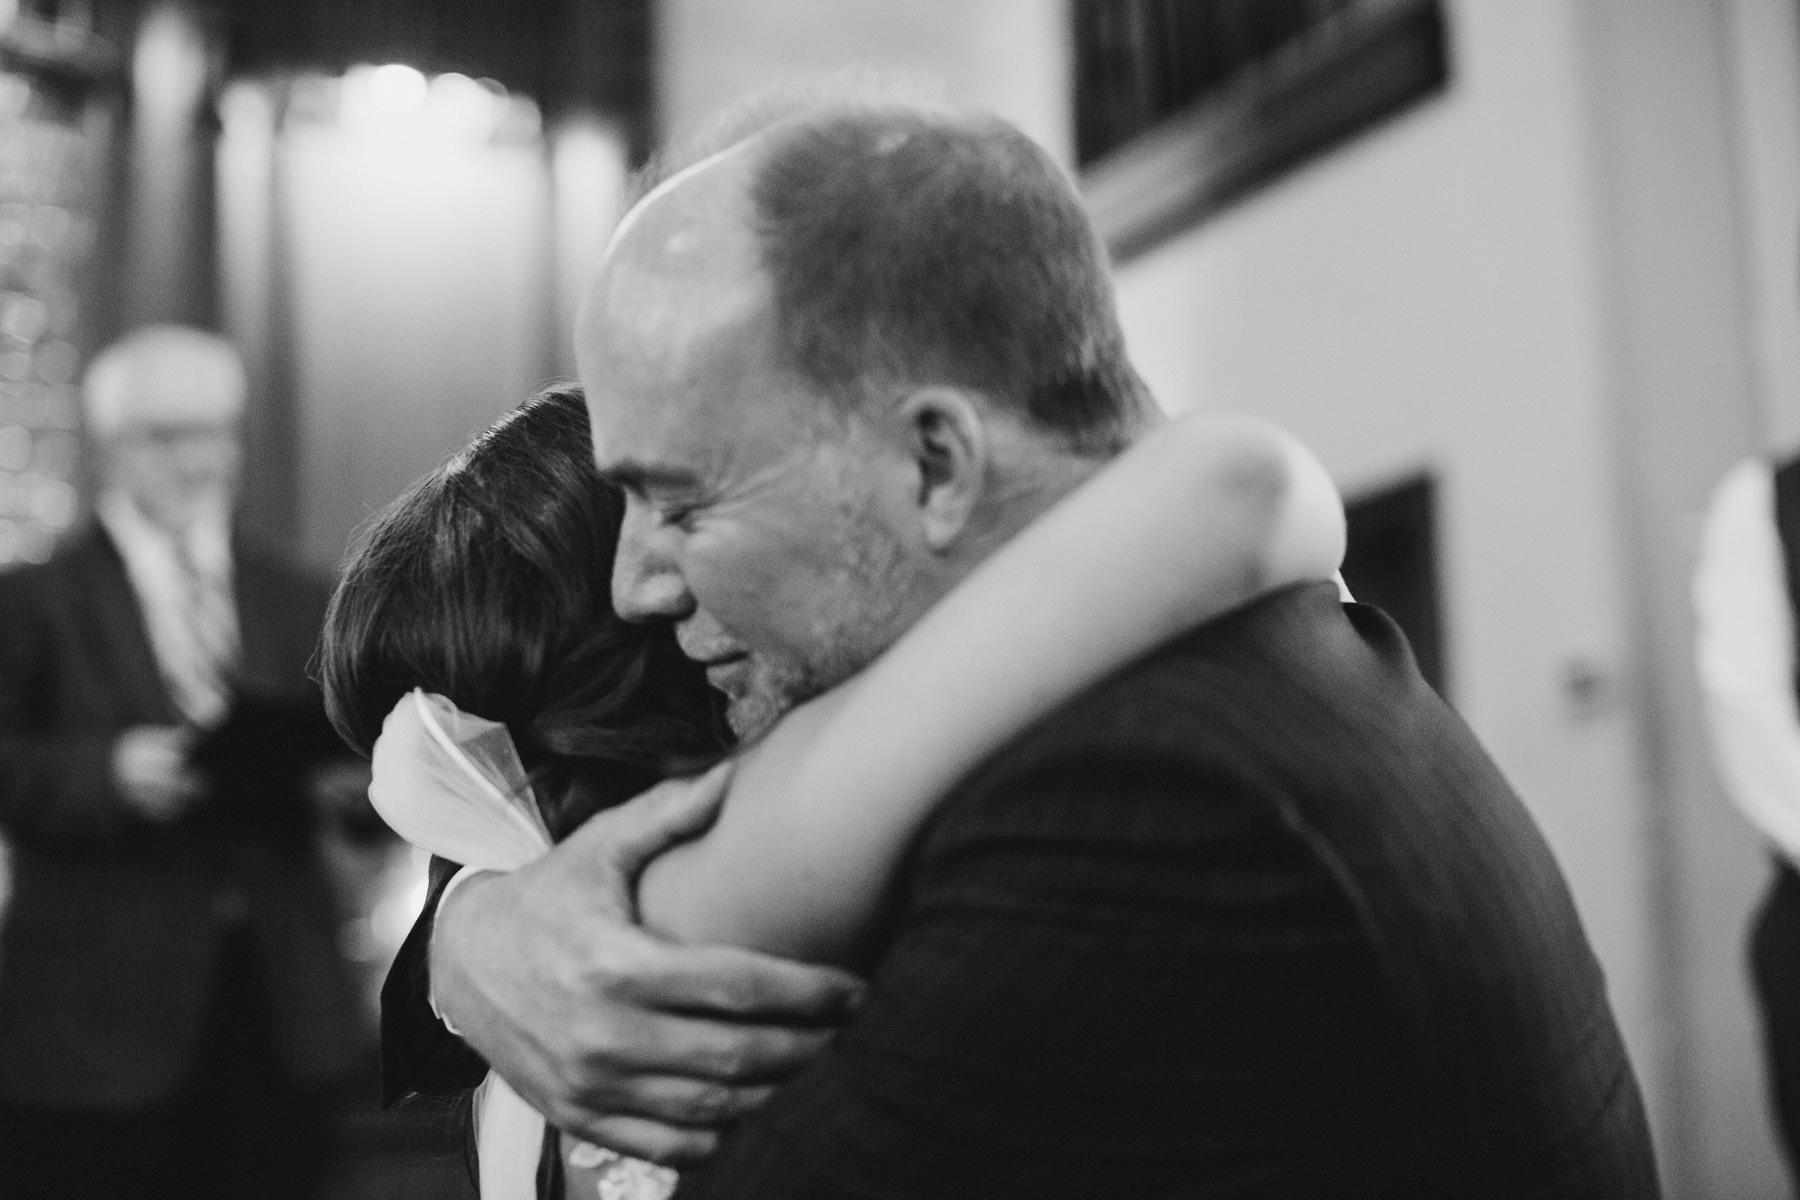 Kansas City Summer Wedding at the Guild_Kindling Wedding Photography Blog48.JPG